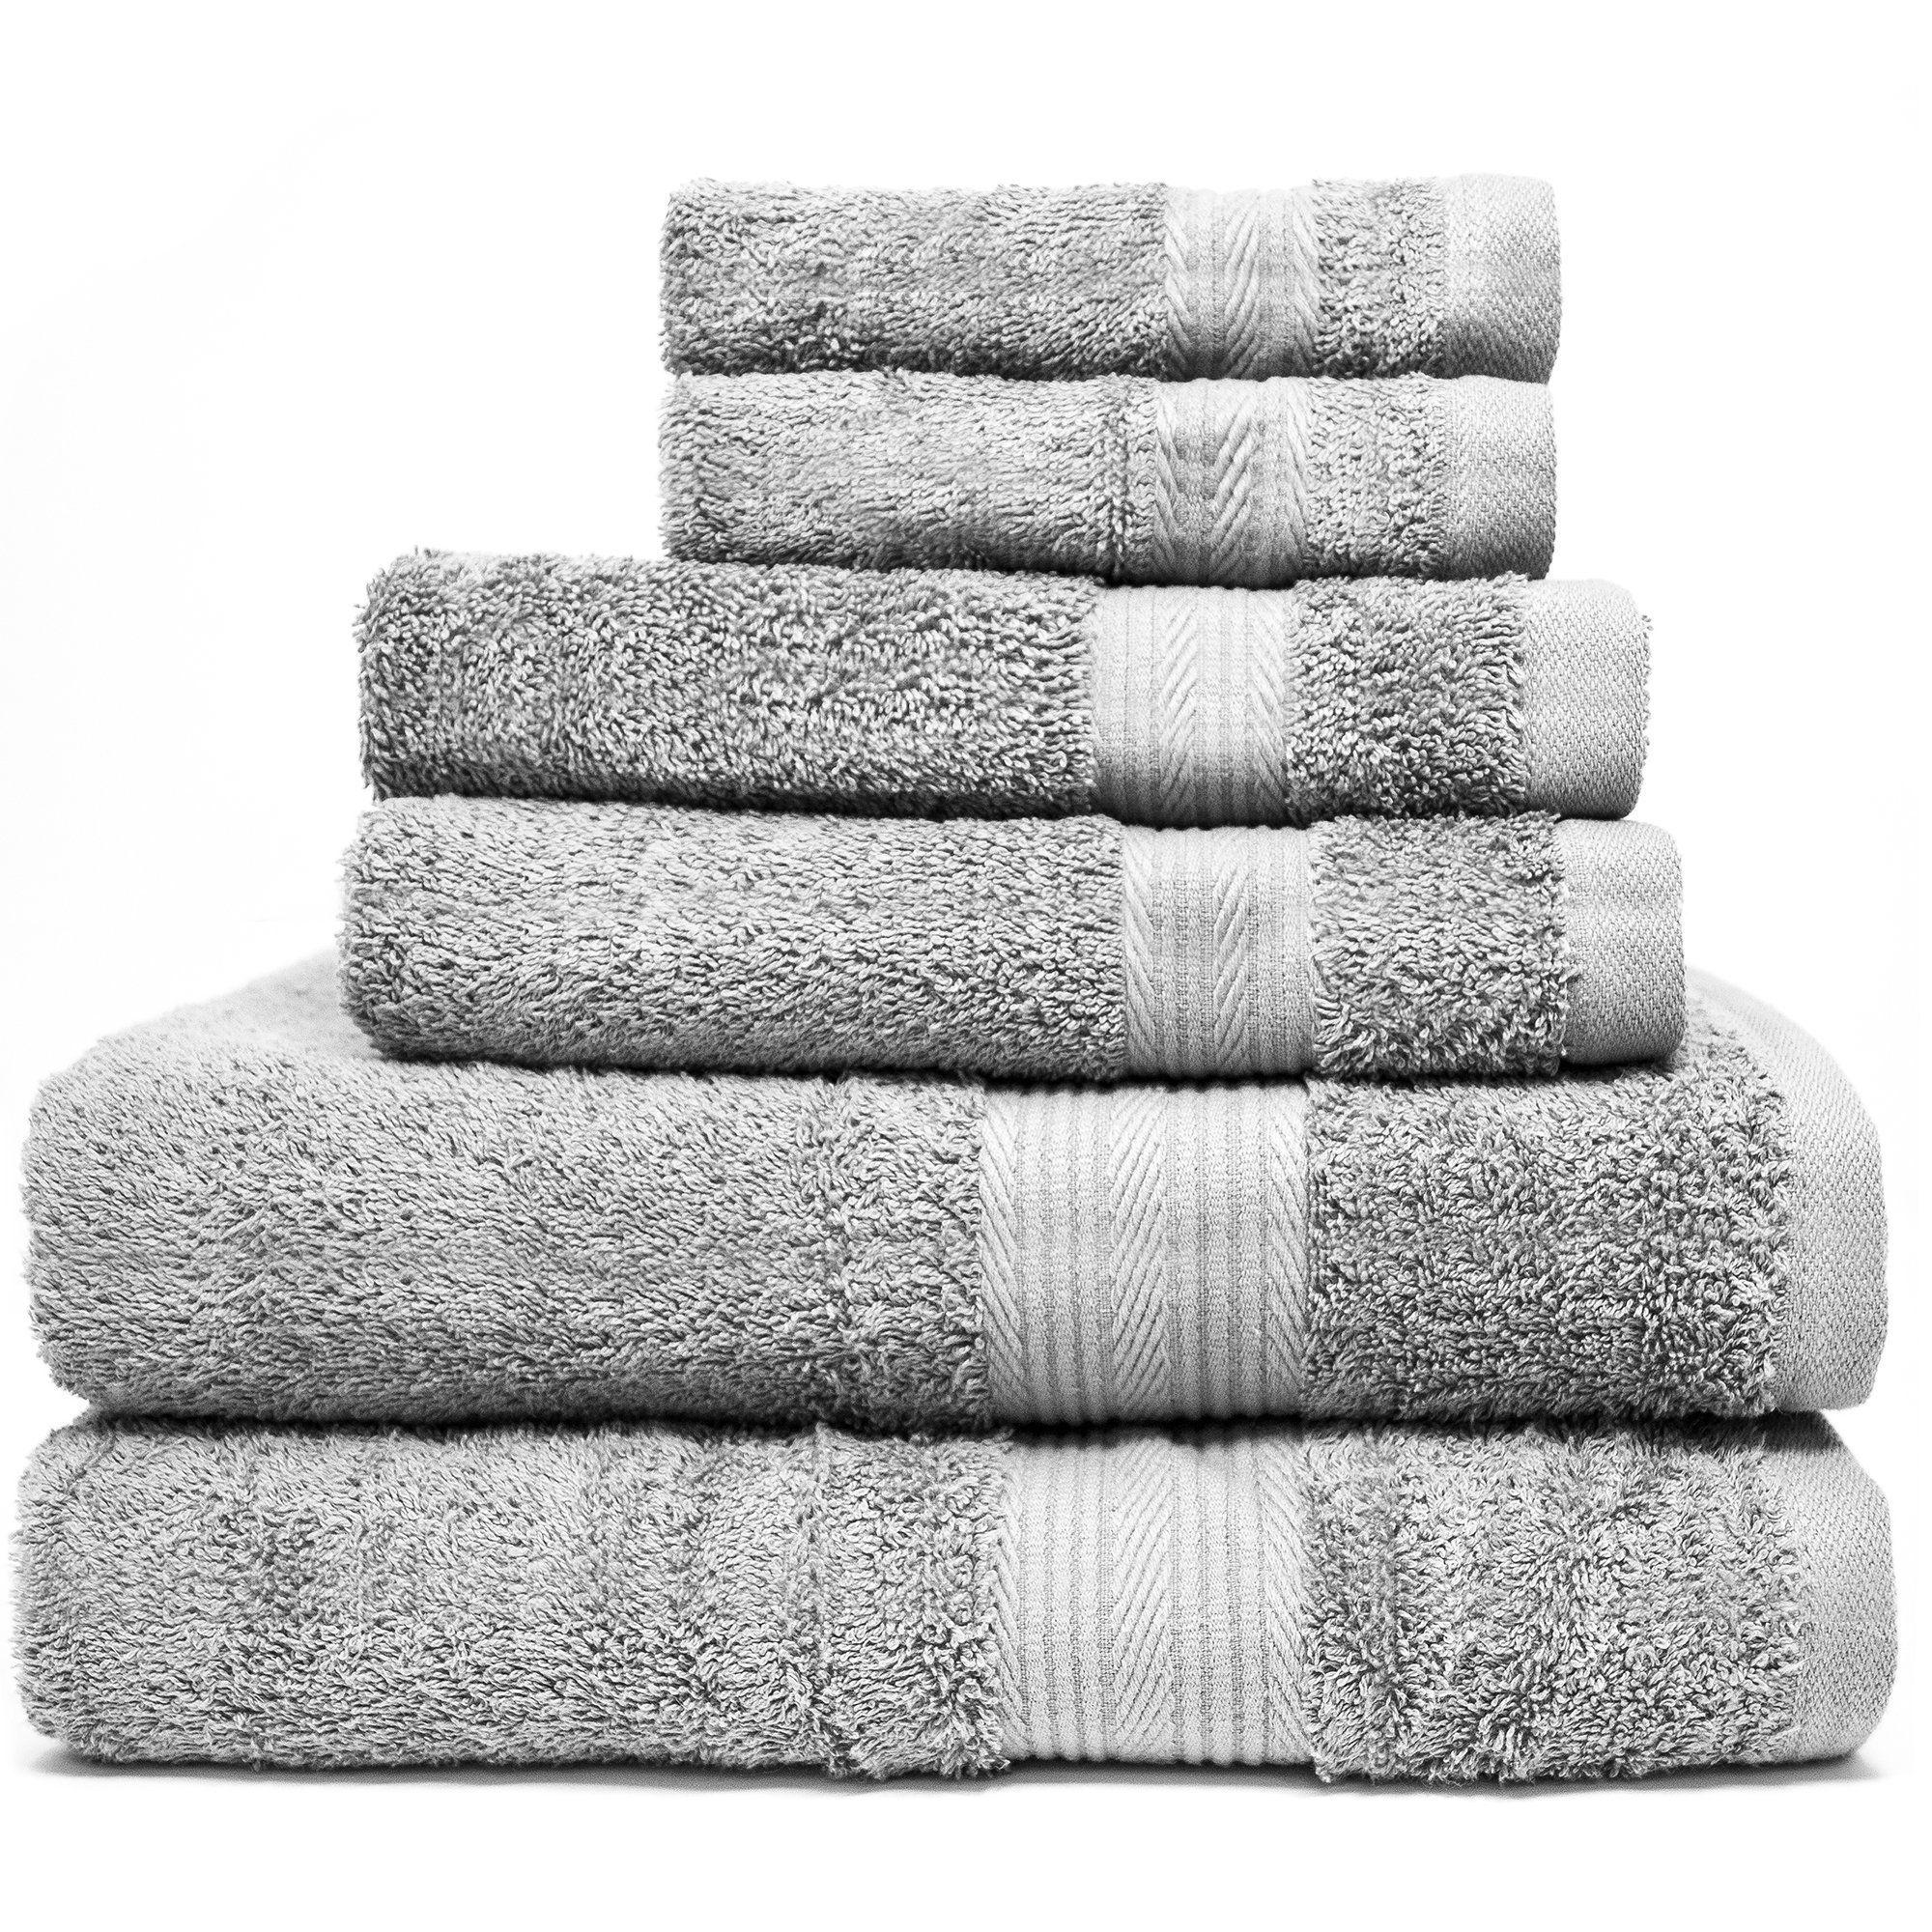 Zeppoli 6 Piece Towel Set 100 Cotton Grey Towels 2 Bath